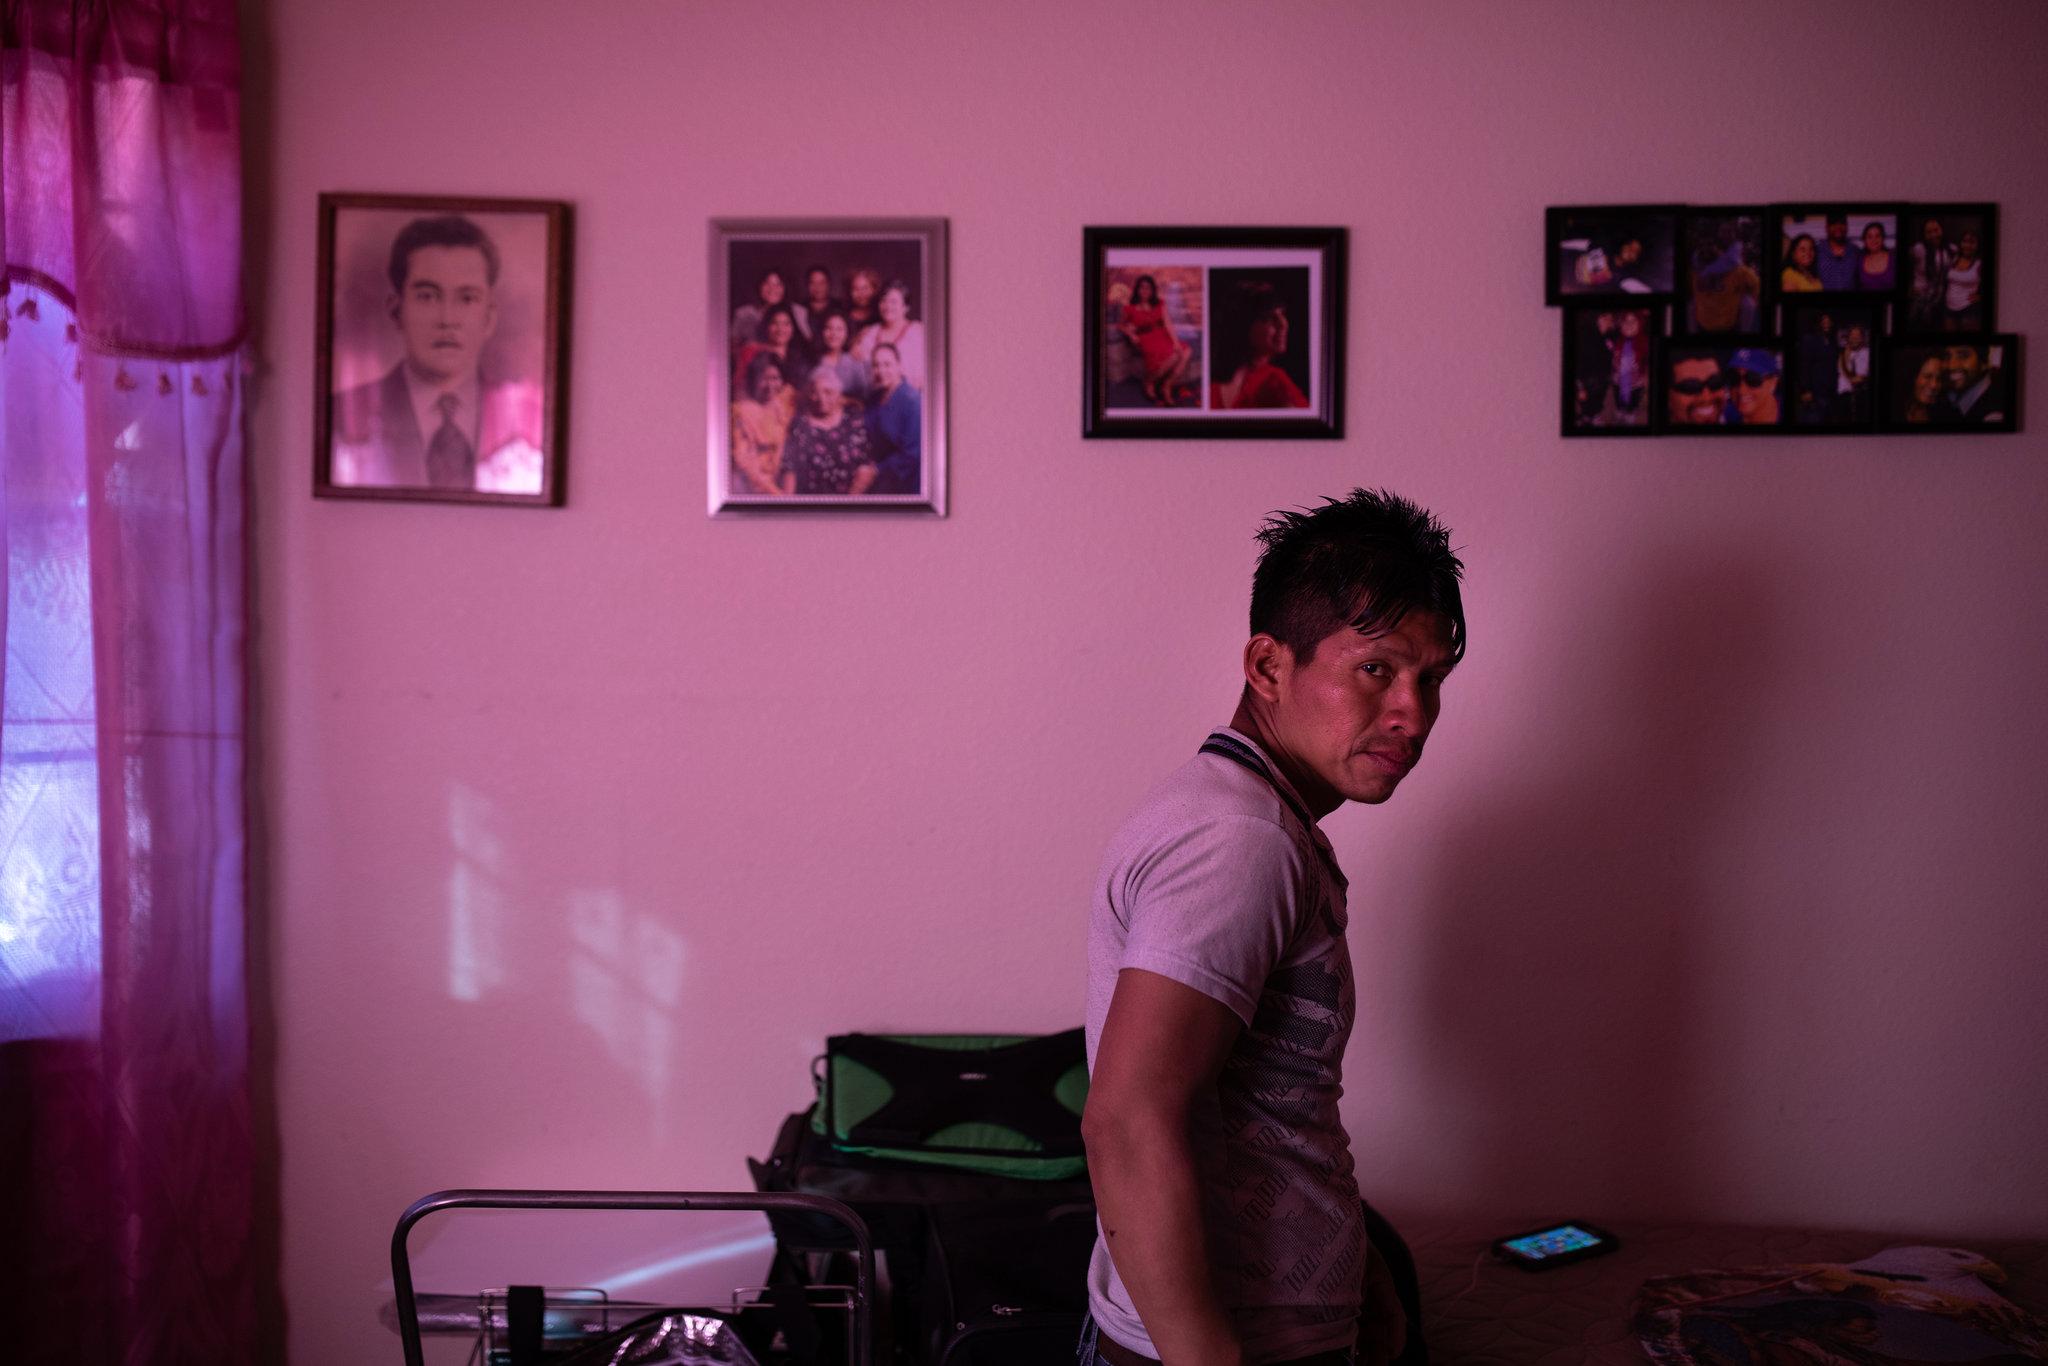 Pablo en Nuevo México (Tamir Kalifa para The New York Times)